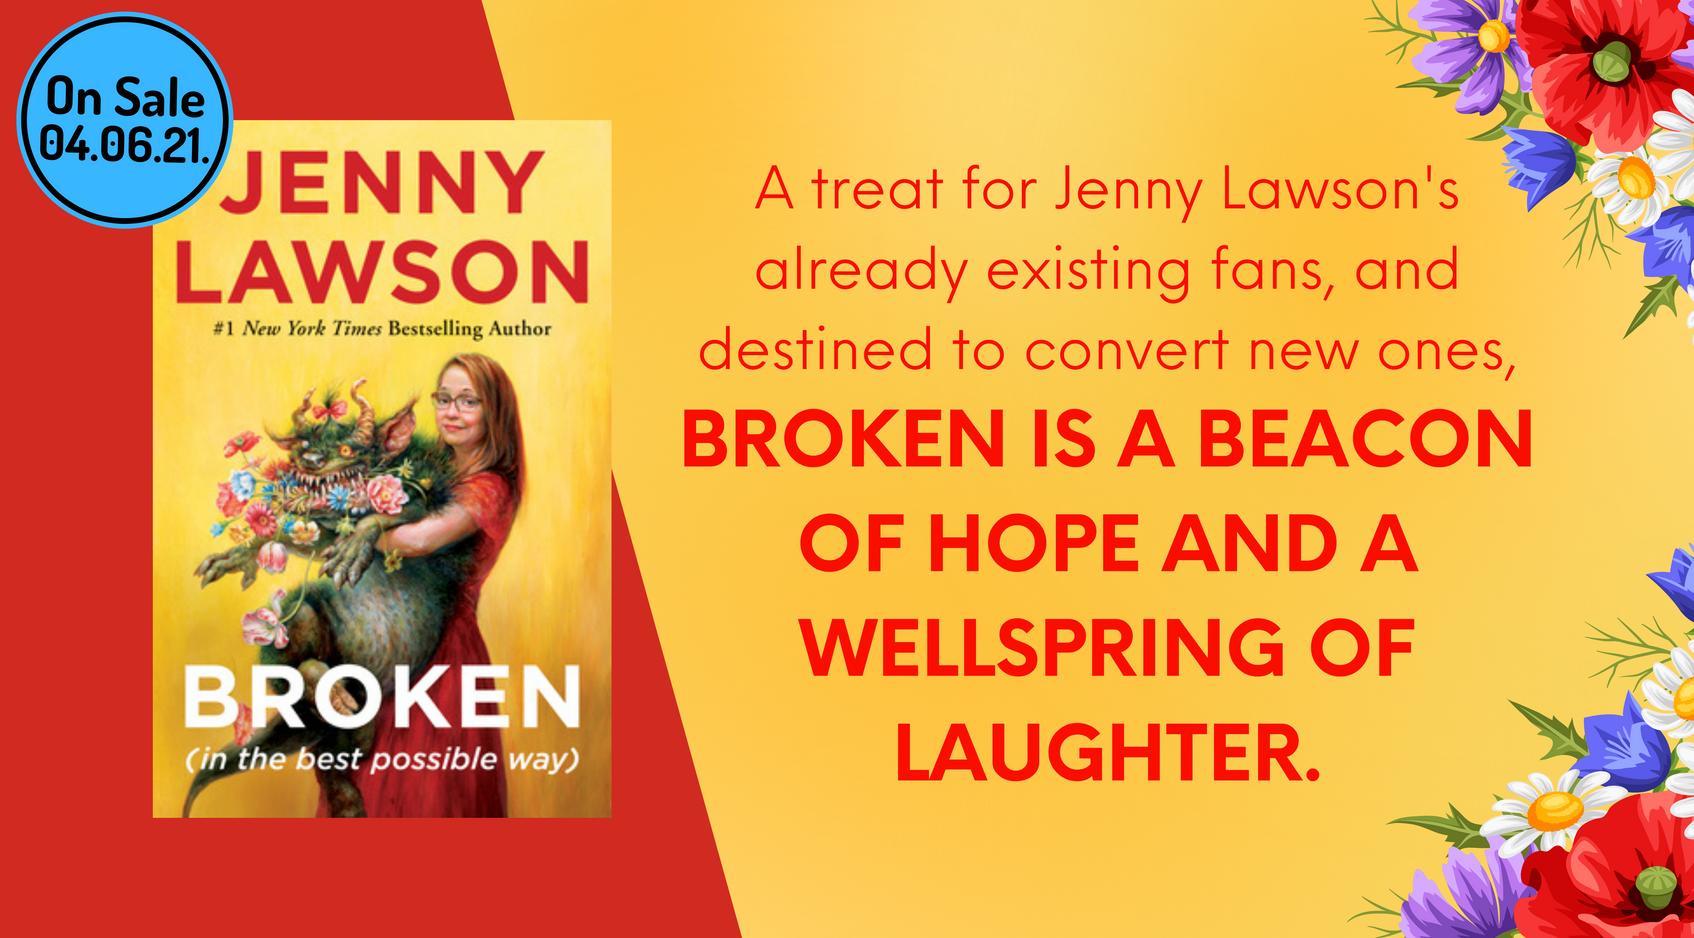 Broken by Jenny Lawson